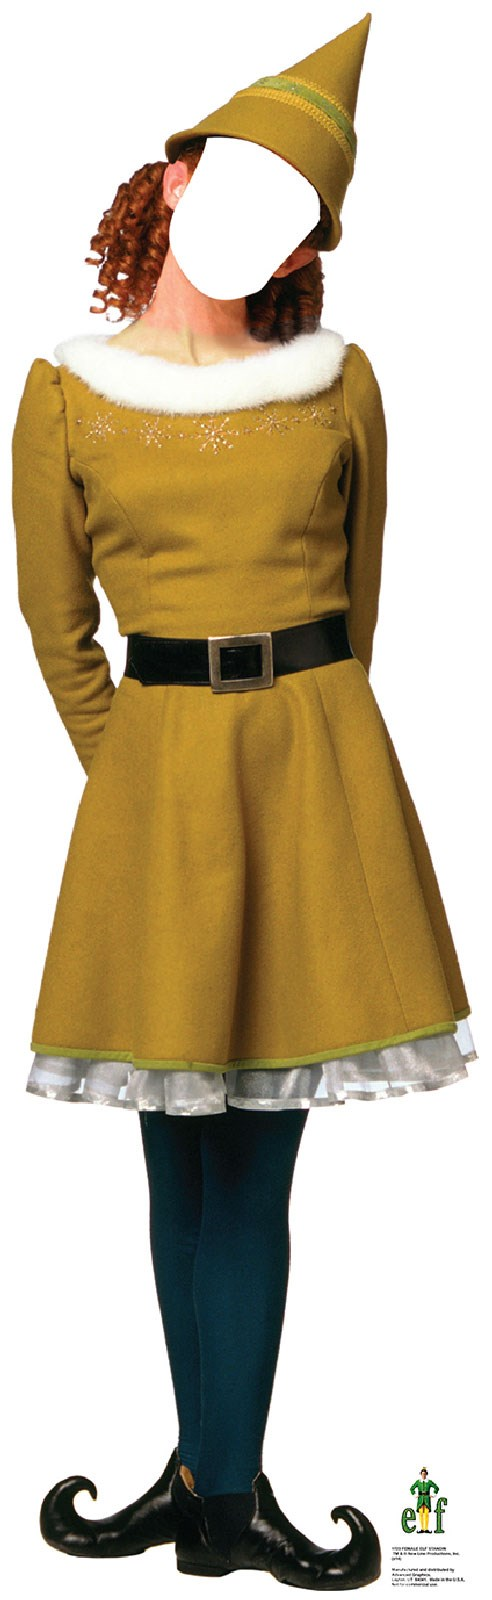 Female Elf Cardboard Stand Up 5.6